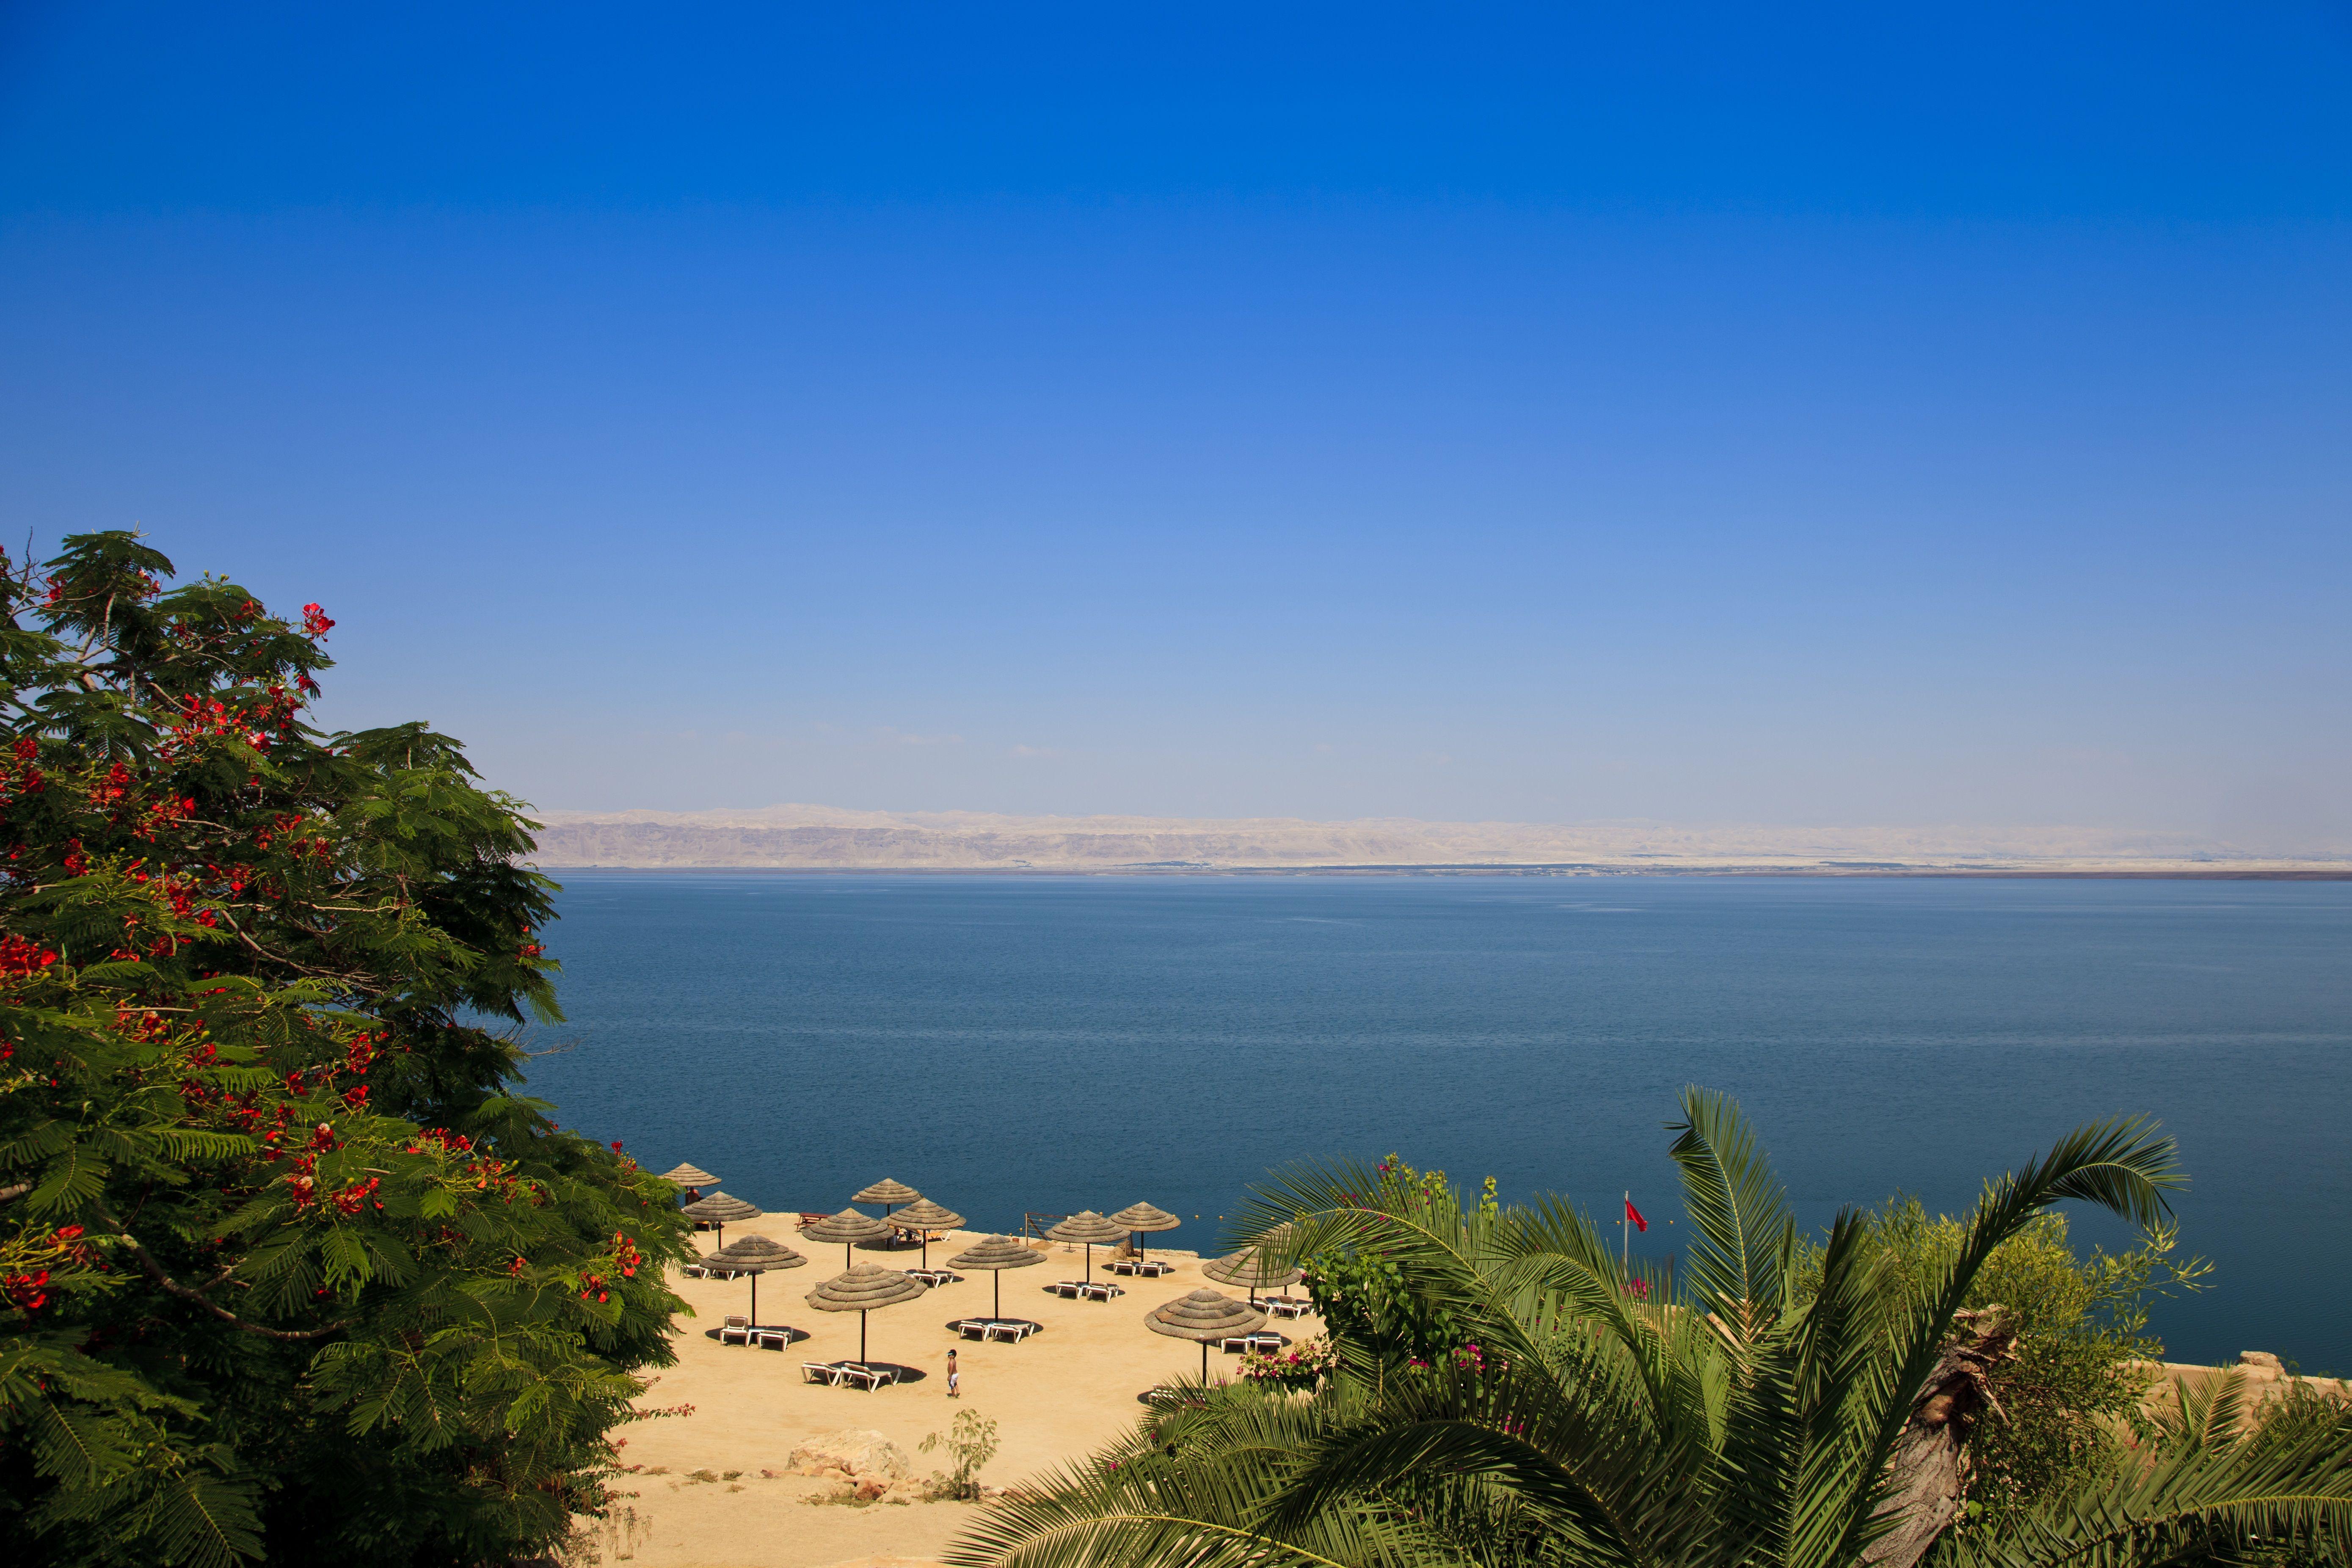 Beach At The Lowest Point On Earth Tropical Beach Dead Sea Israel Earth